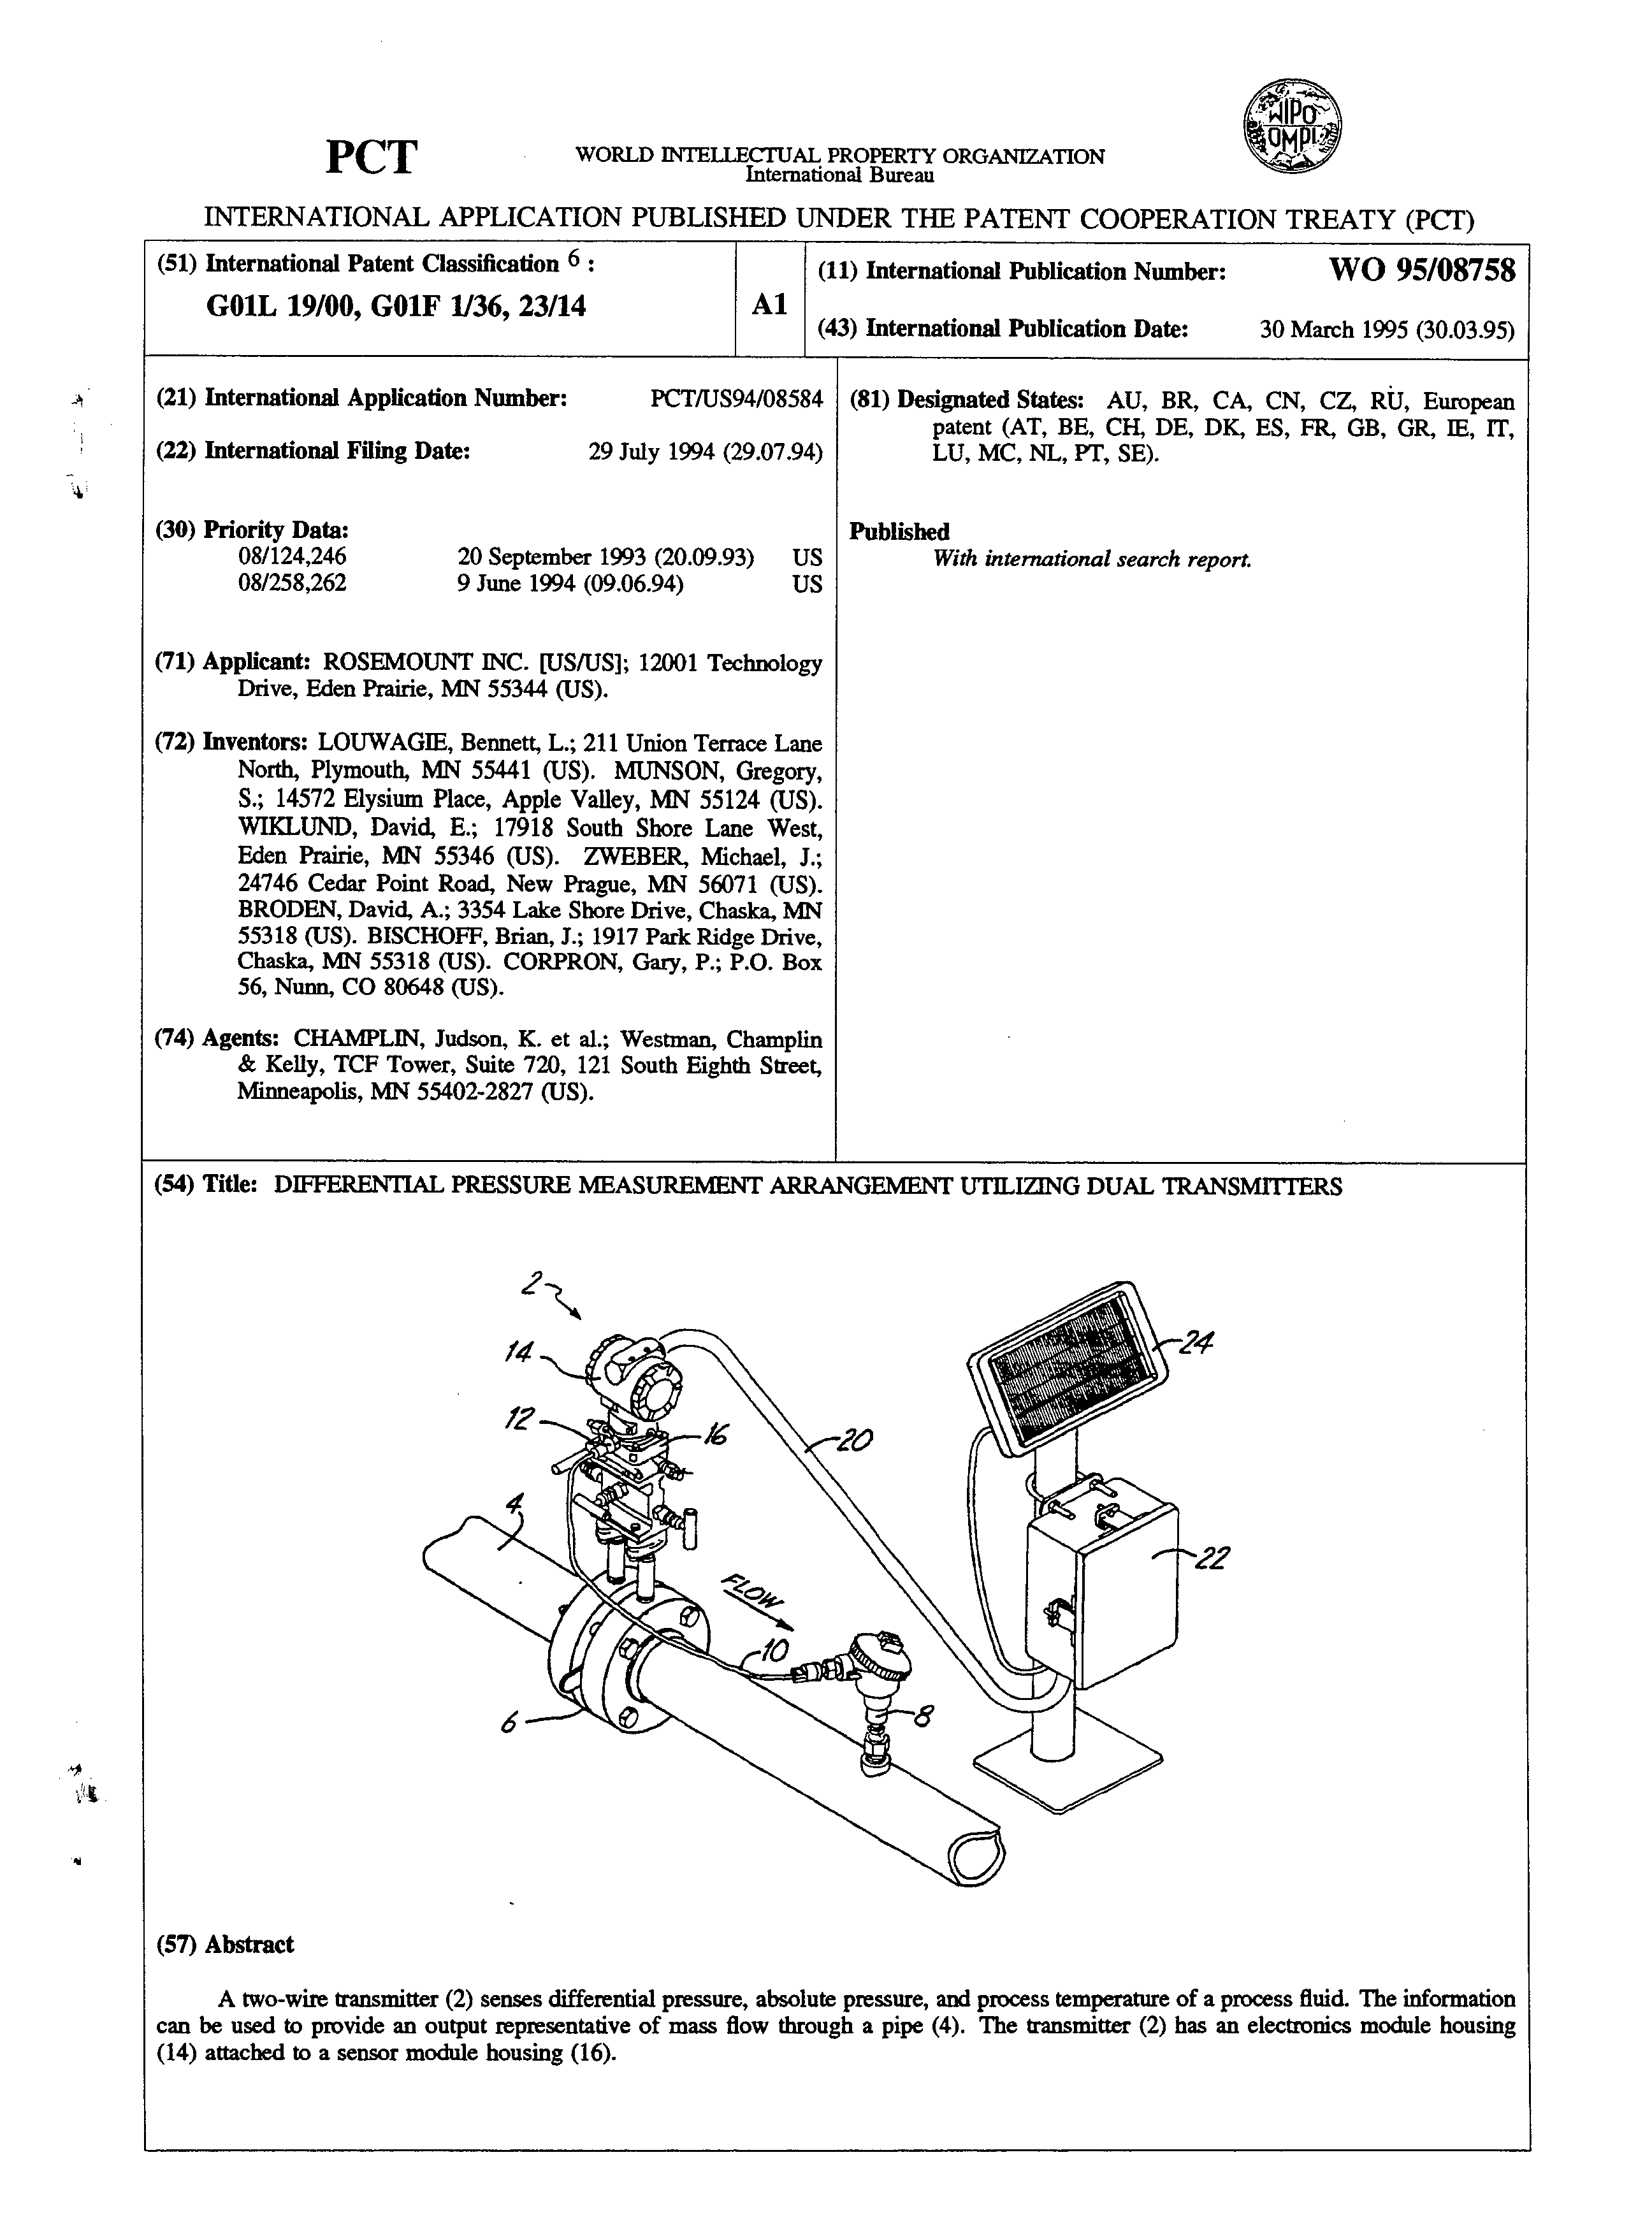 EP 0720732 A1 - Differential Pressure Measurement